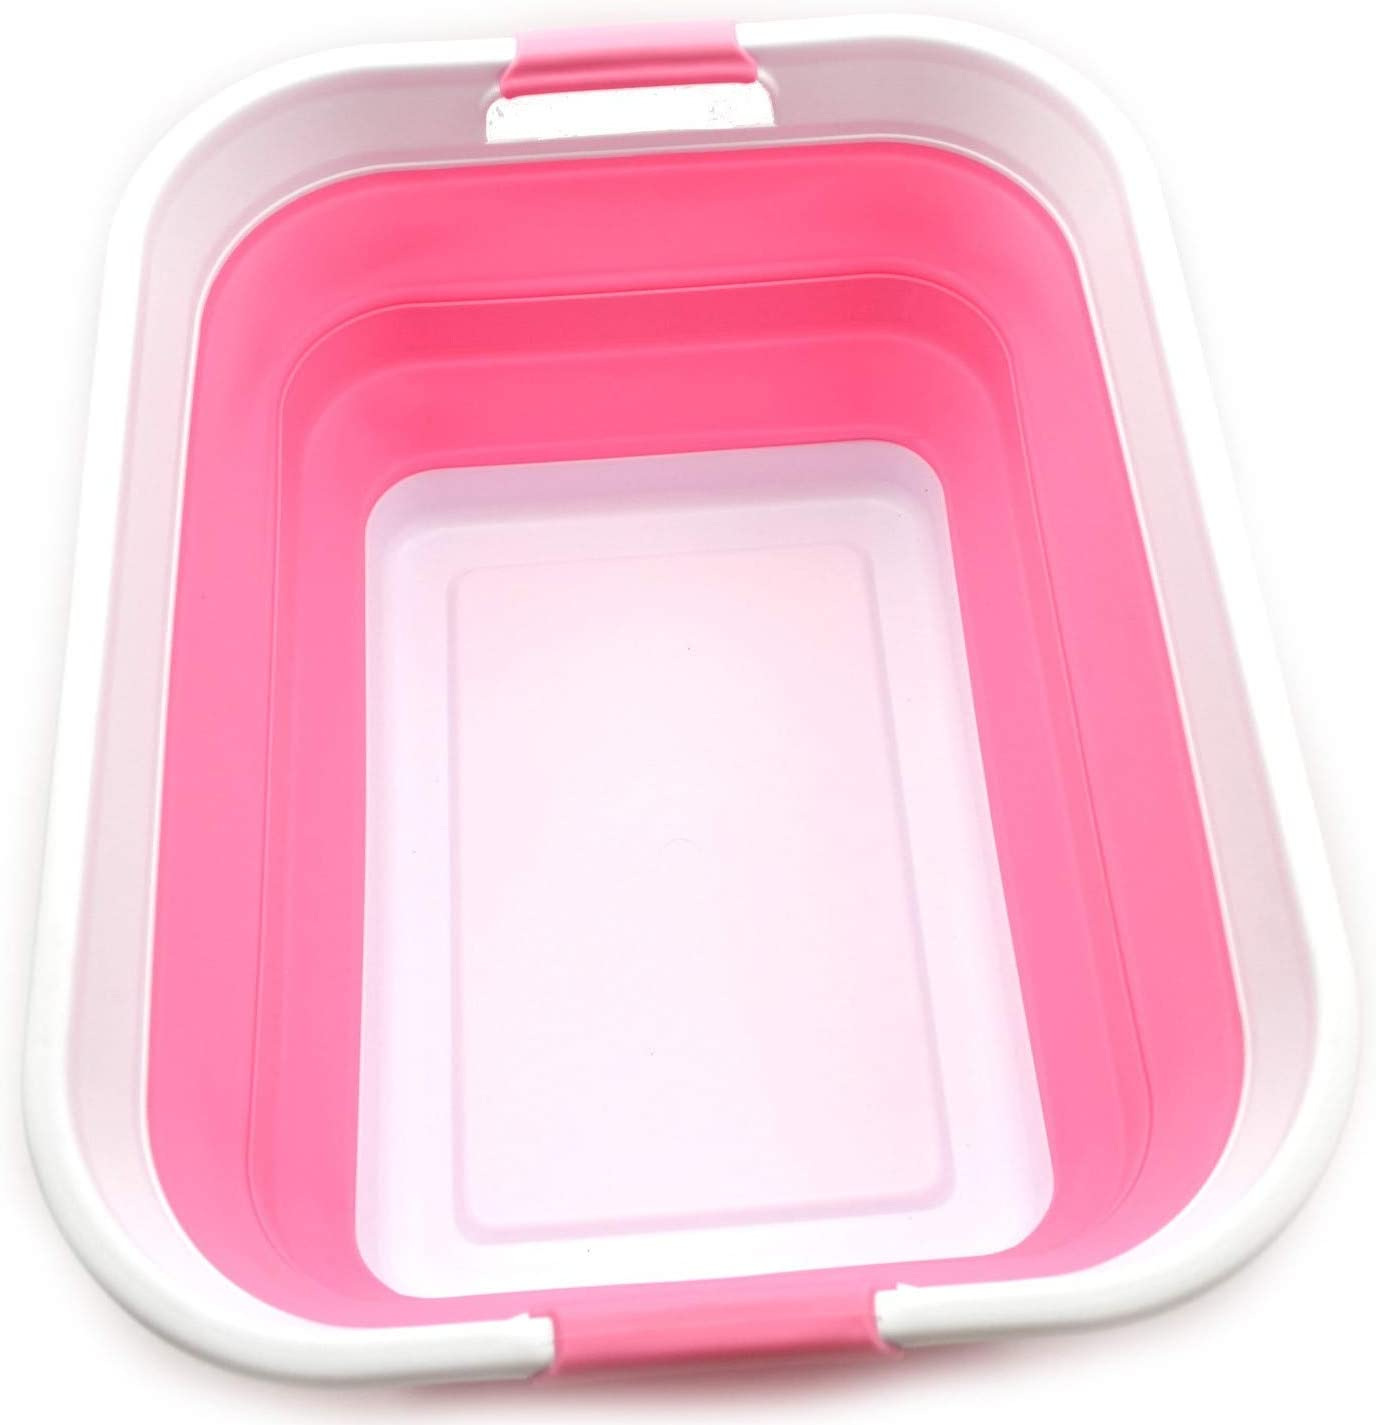 SAMMART Collapsible Brand new Popular brand Plastic Laundry Basket Up - Sto Foldable Pop